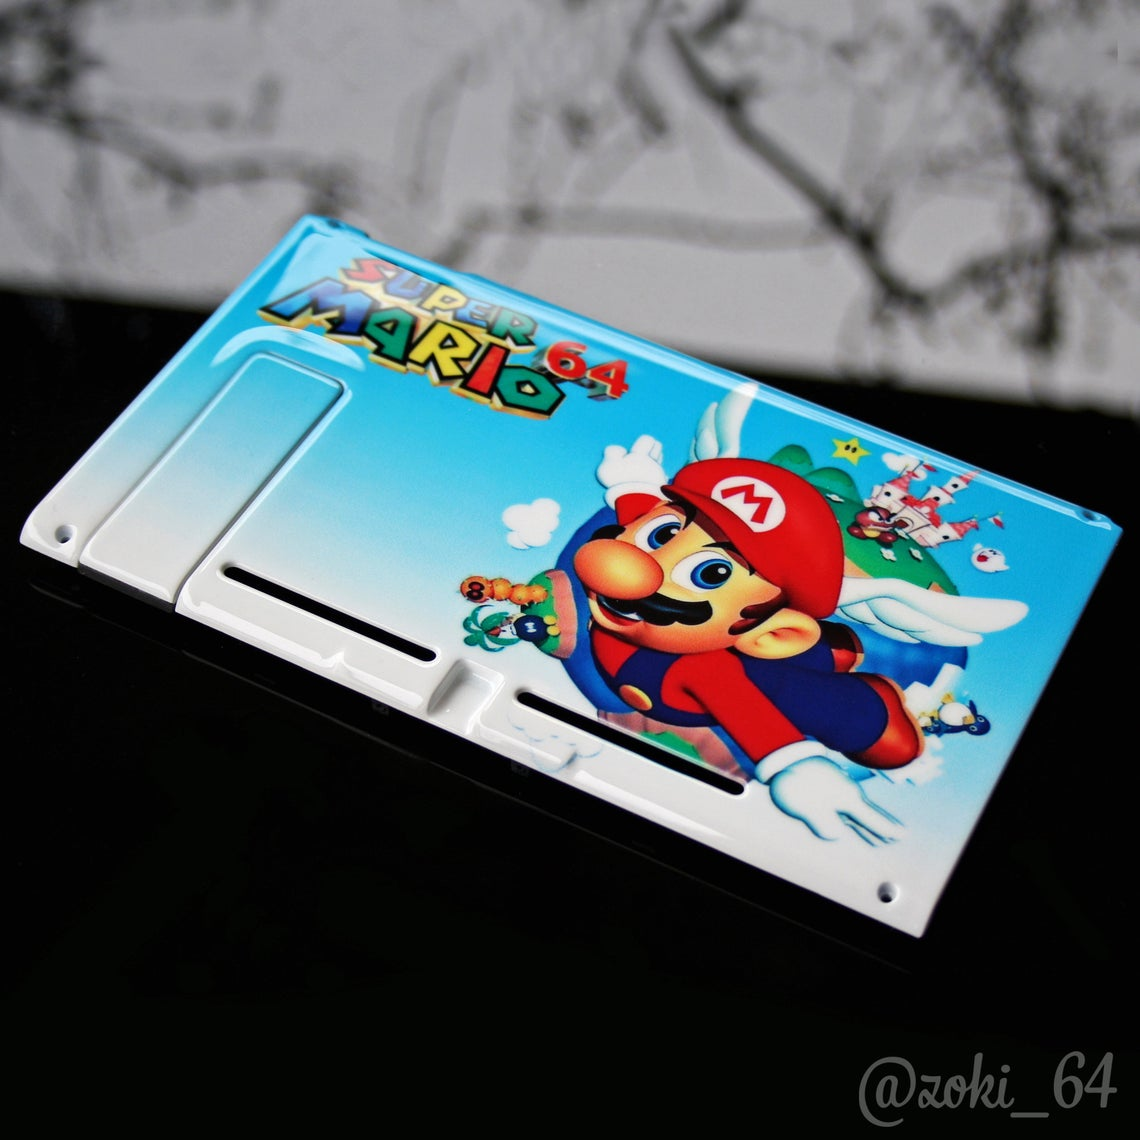 Custom Super Mario 64 switch backplate